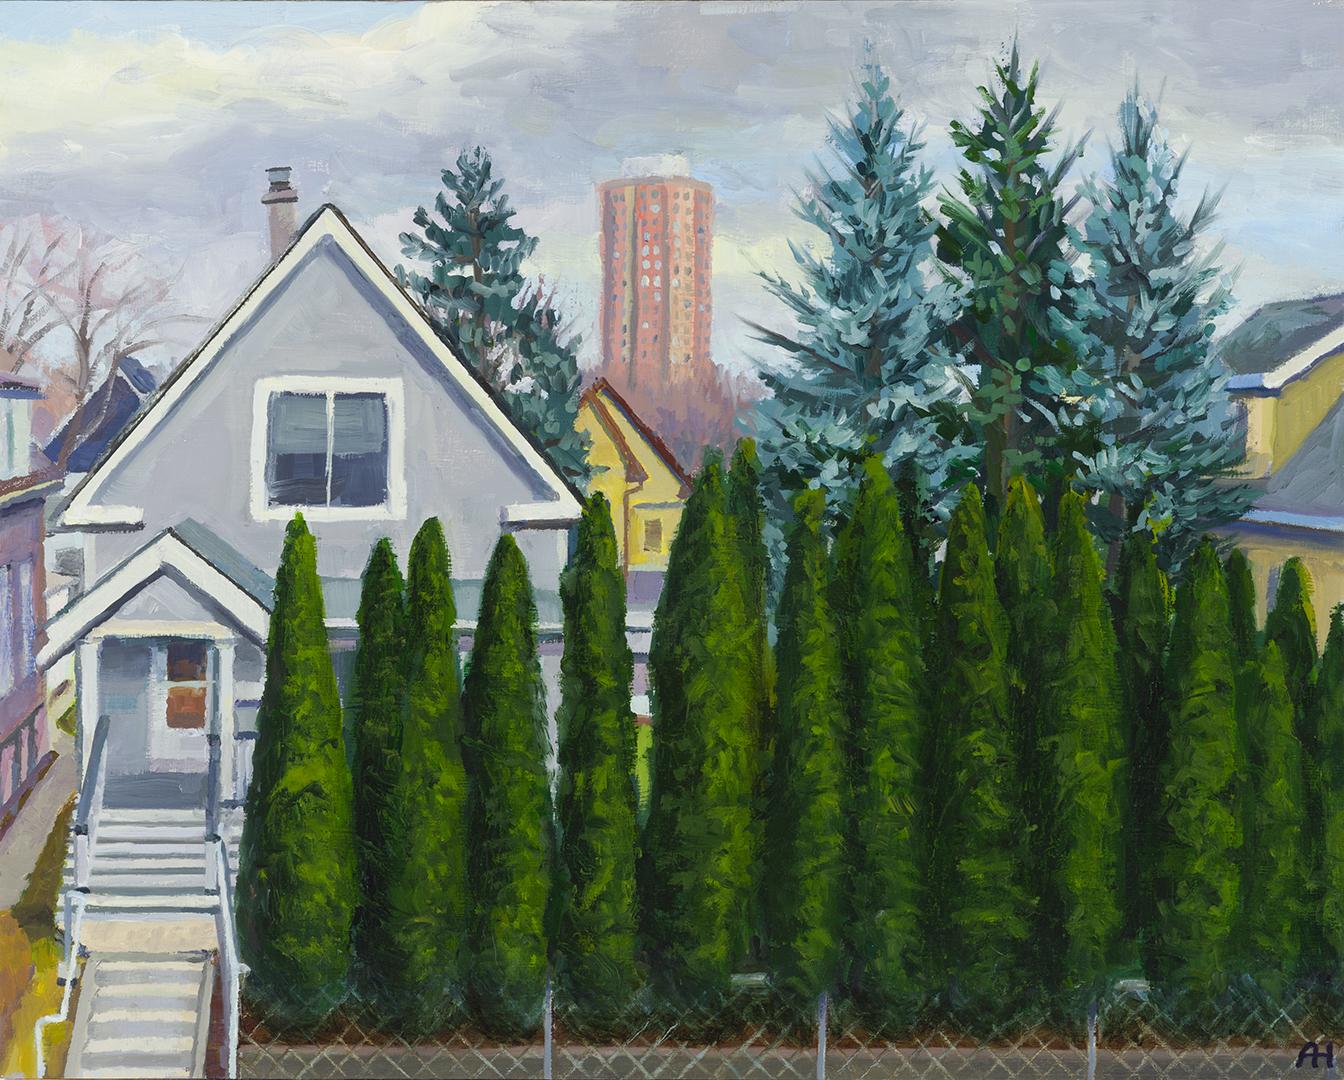 "Neighbors Across the Street, oil on wood, 8"" x 10"", 2020"